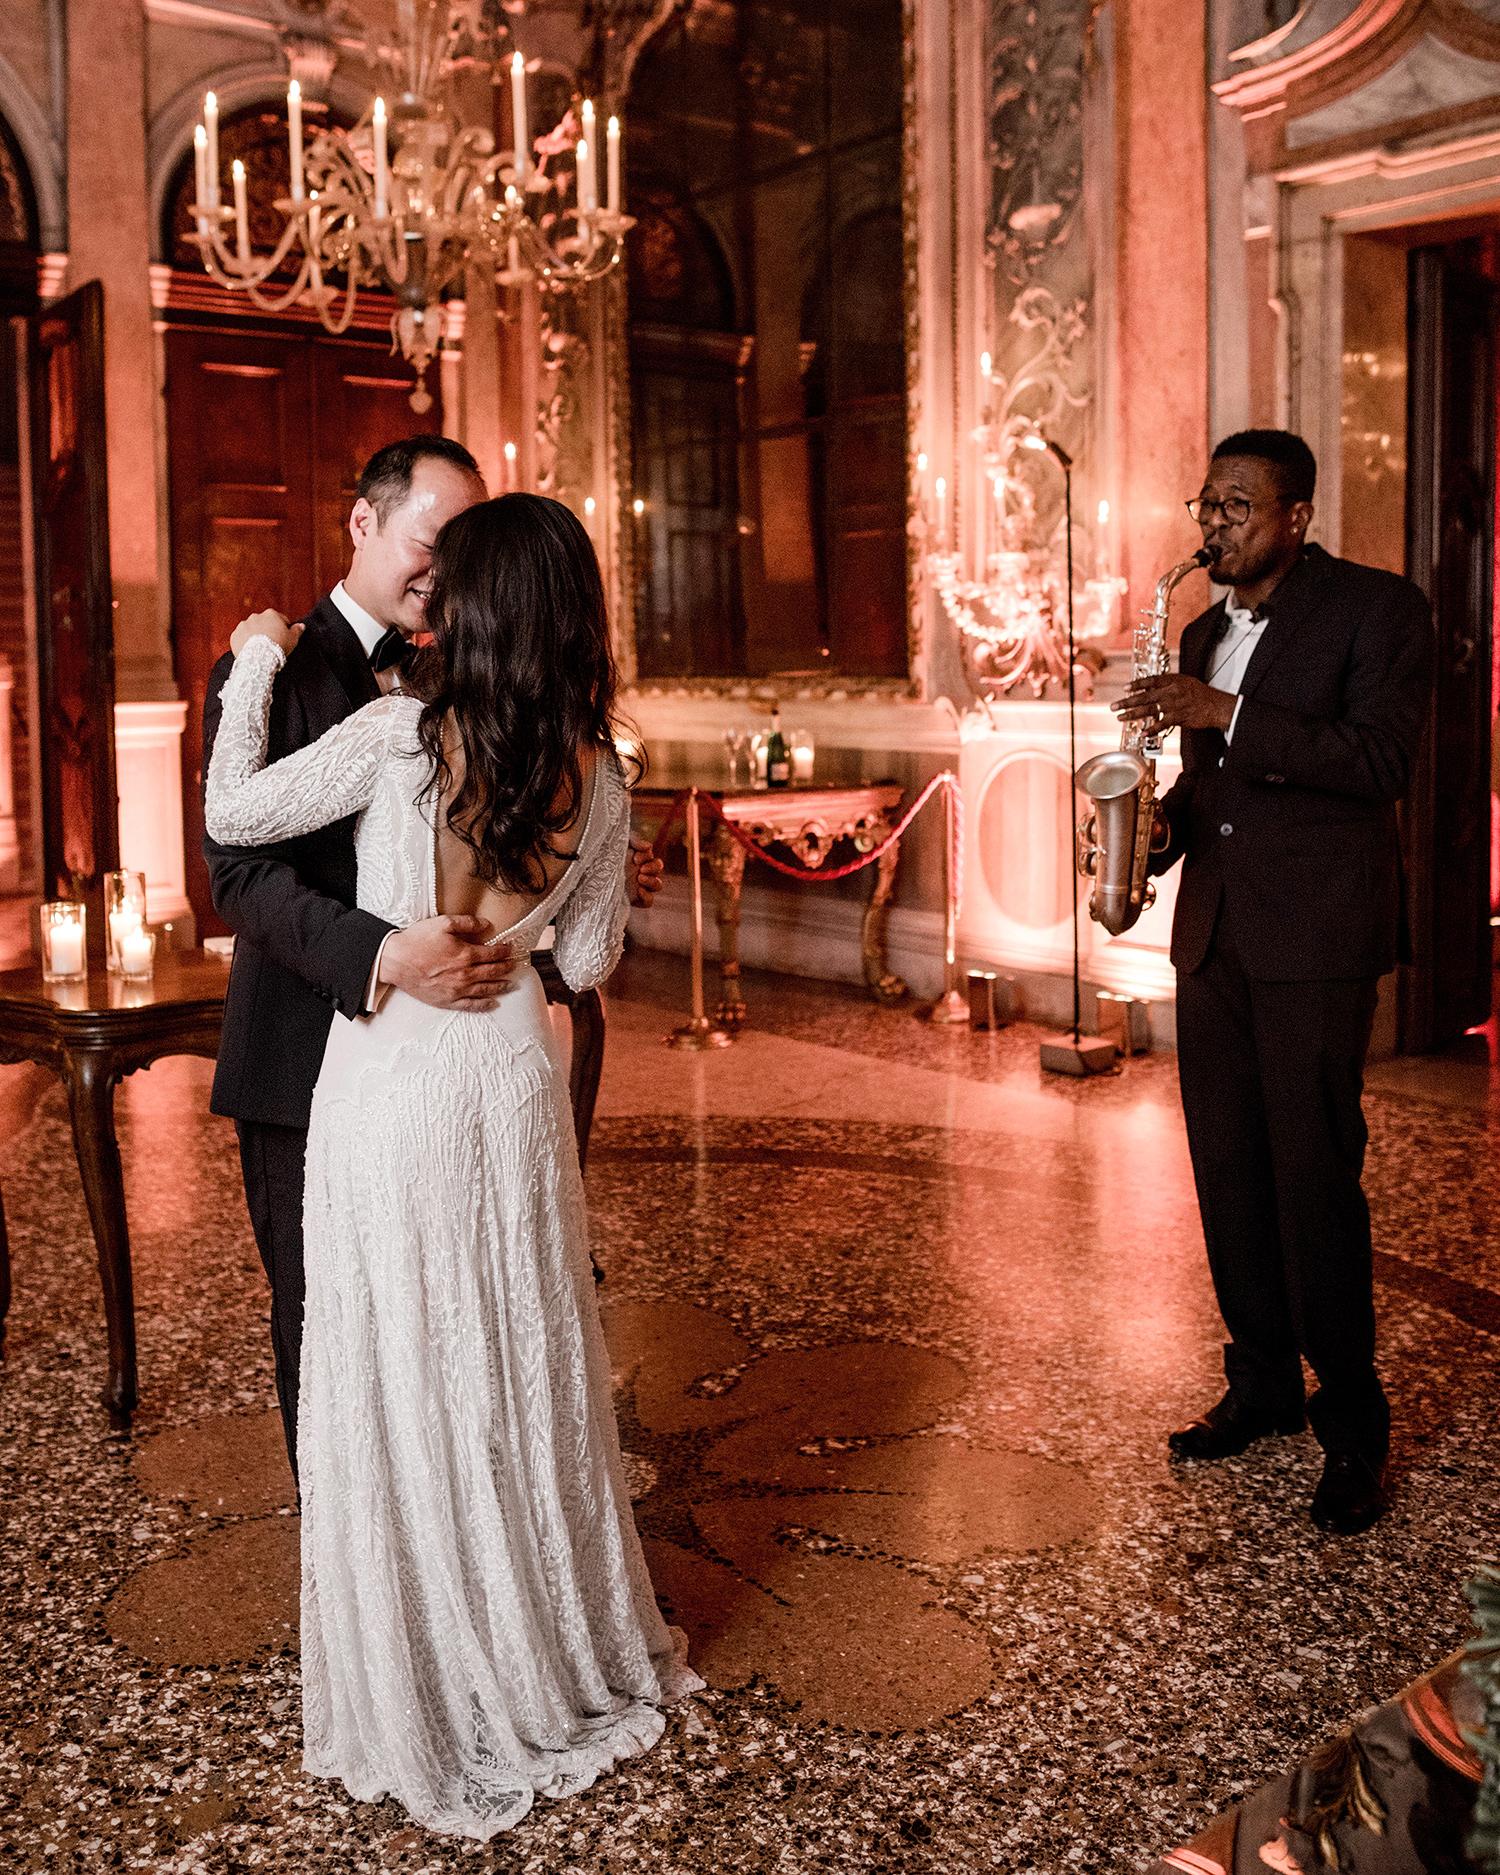 elle raymond venice wedding first dance saxophonist